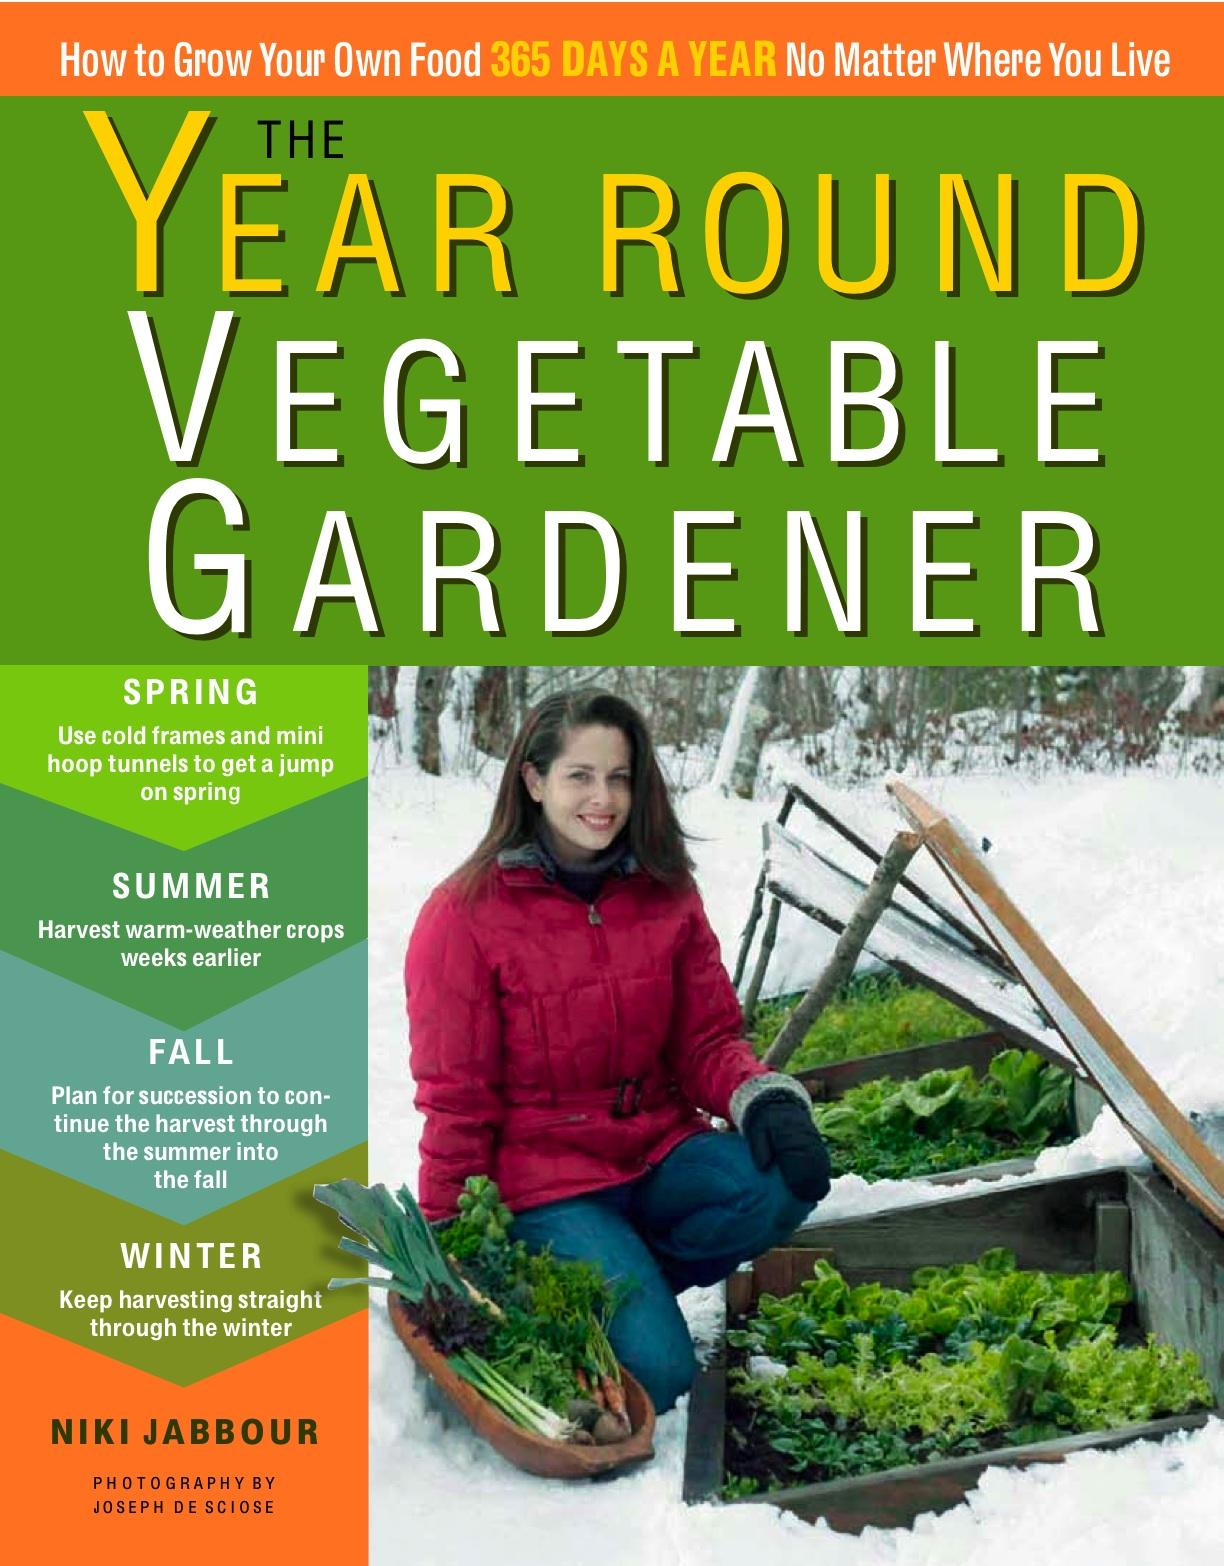 niki jabbour the year round veggie gardener january 2012